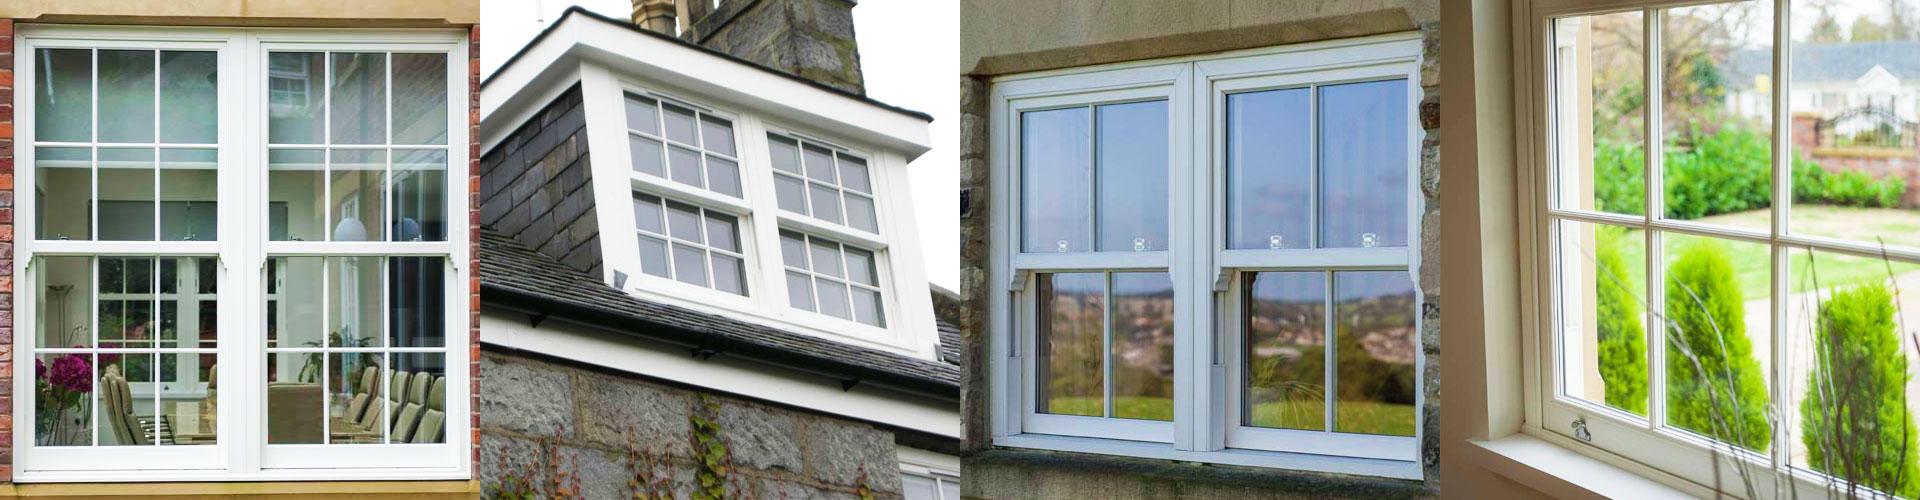 High Quality Sash Windows Aberdeen, Aberdeenshire & North East Scotland